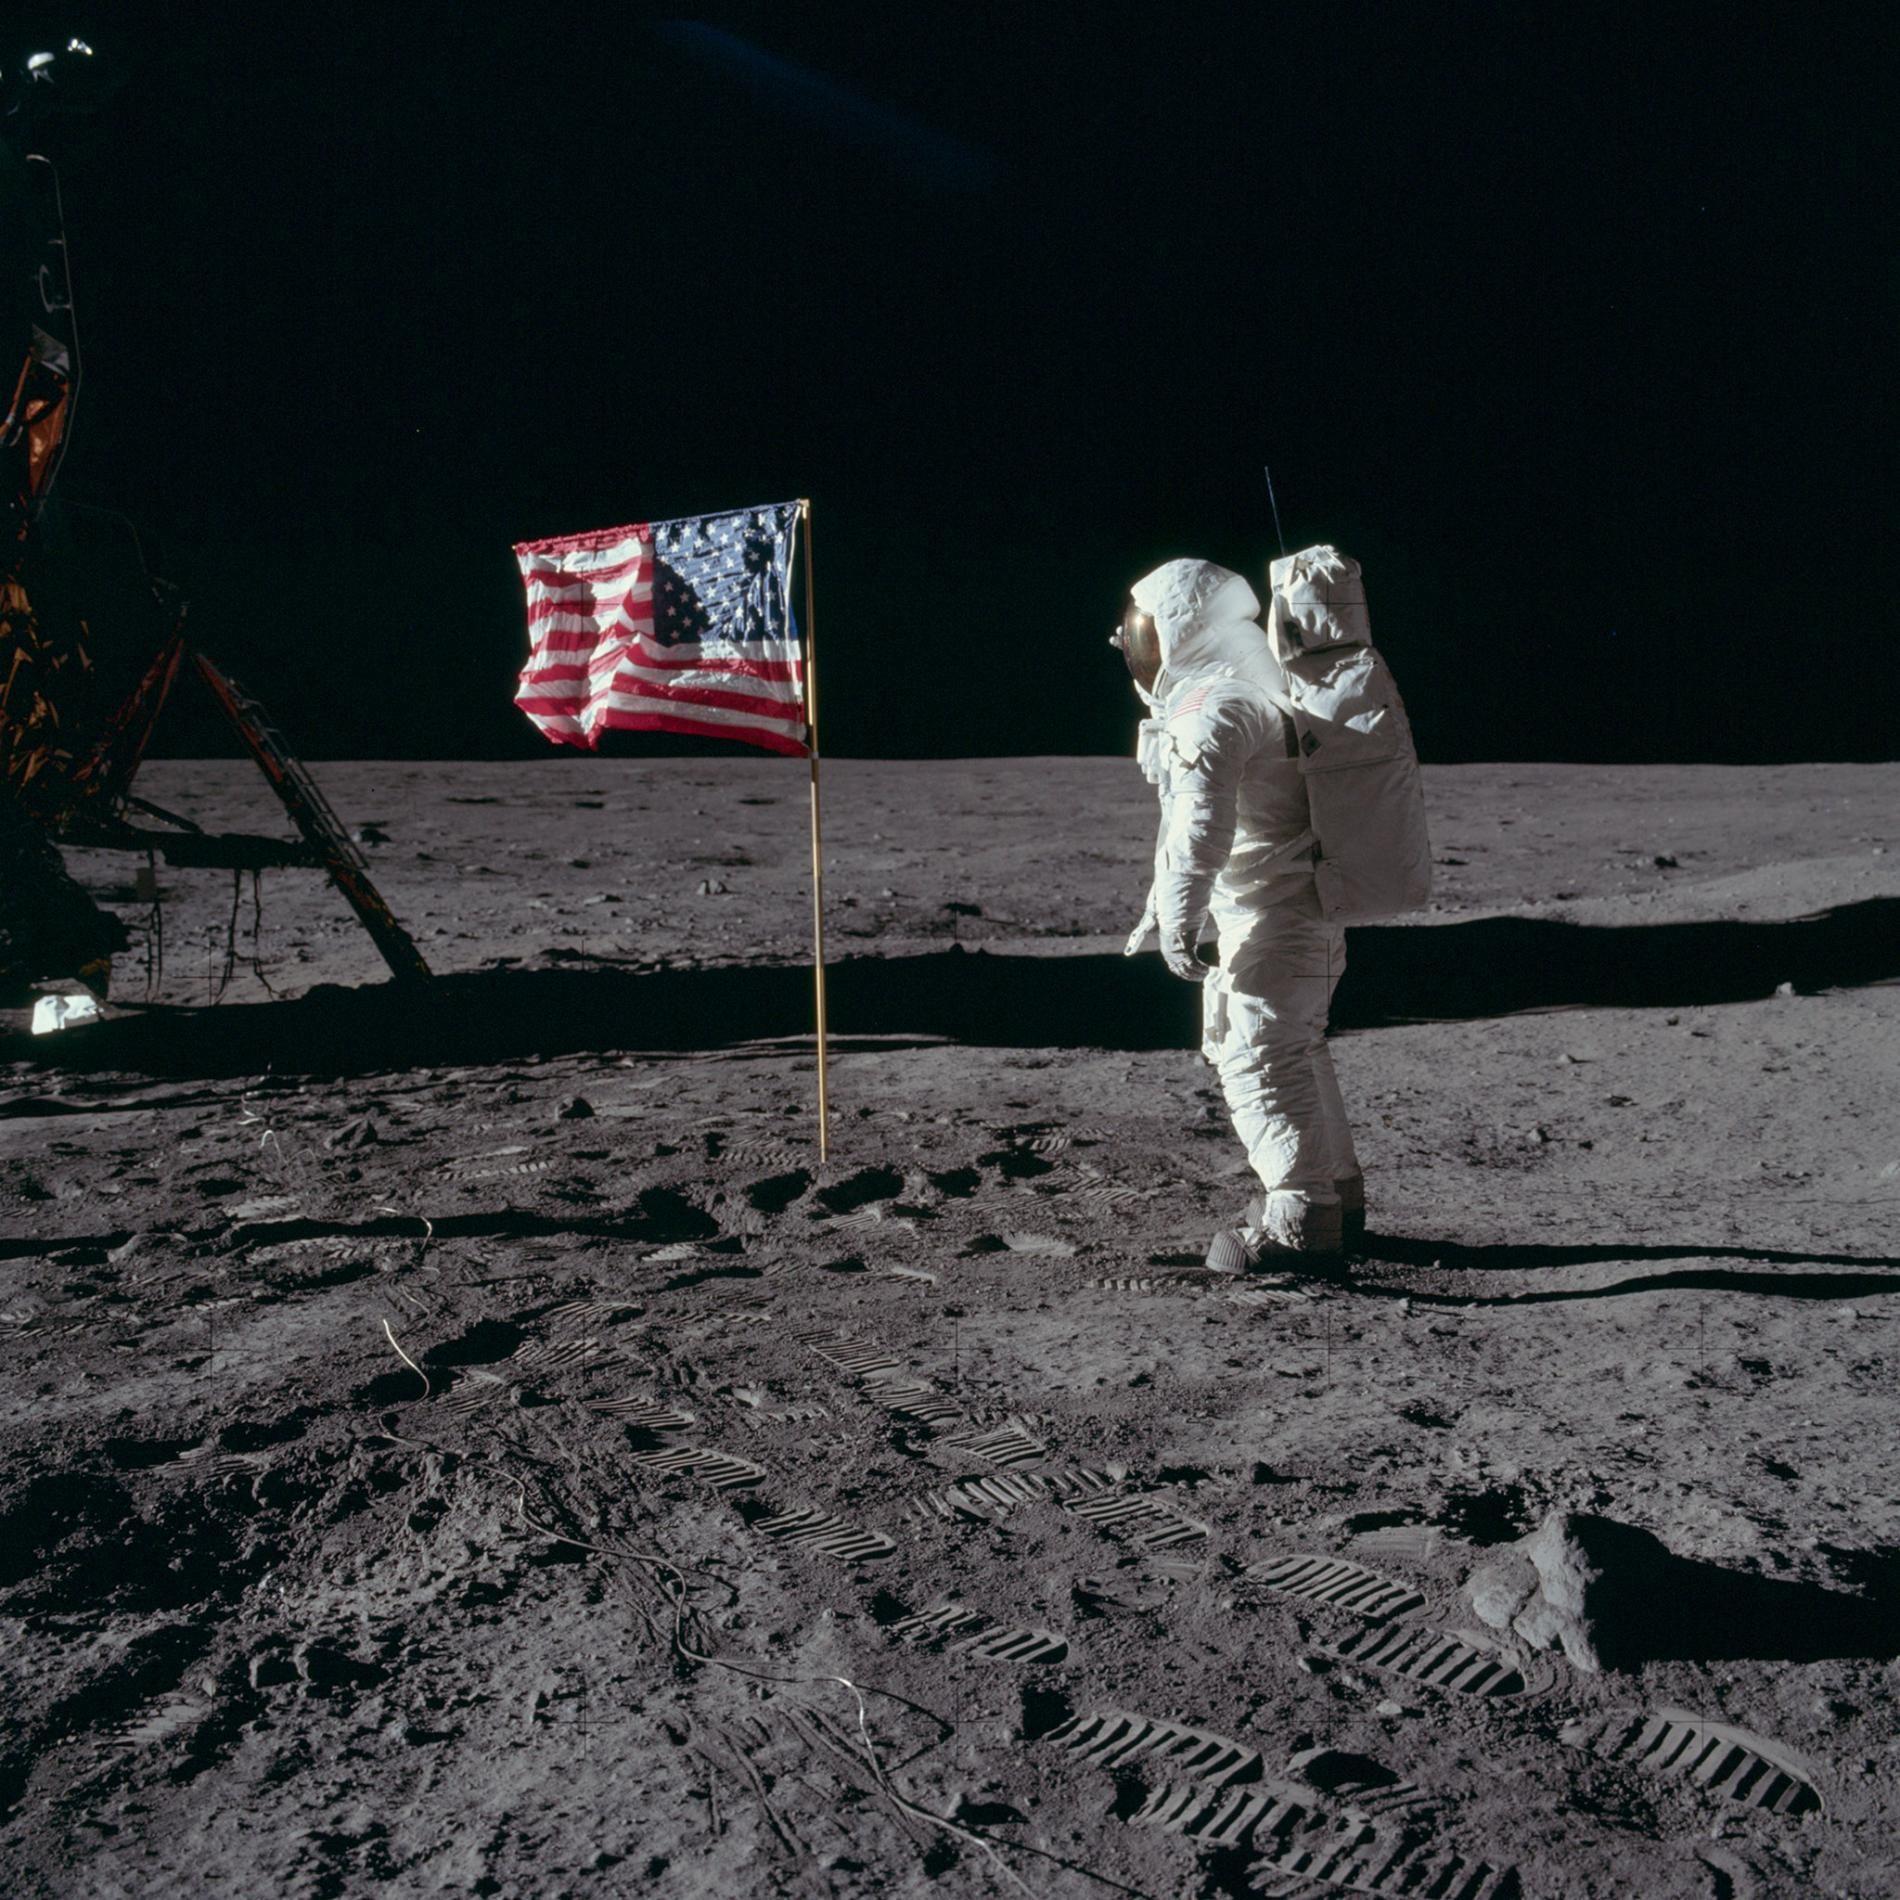 Apollo 11 Moon Landing Crew 8x10 Silver Halide Photo Print